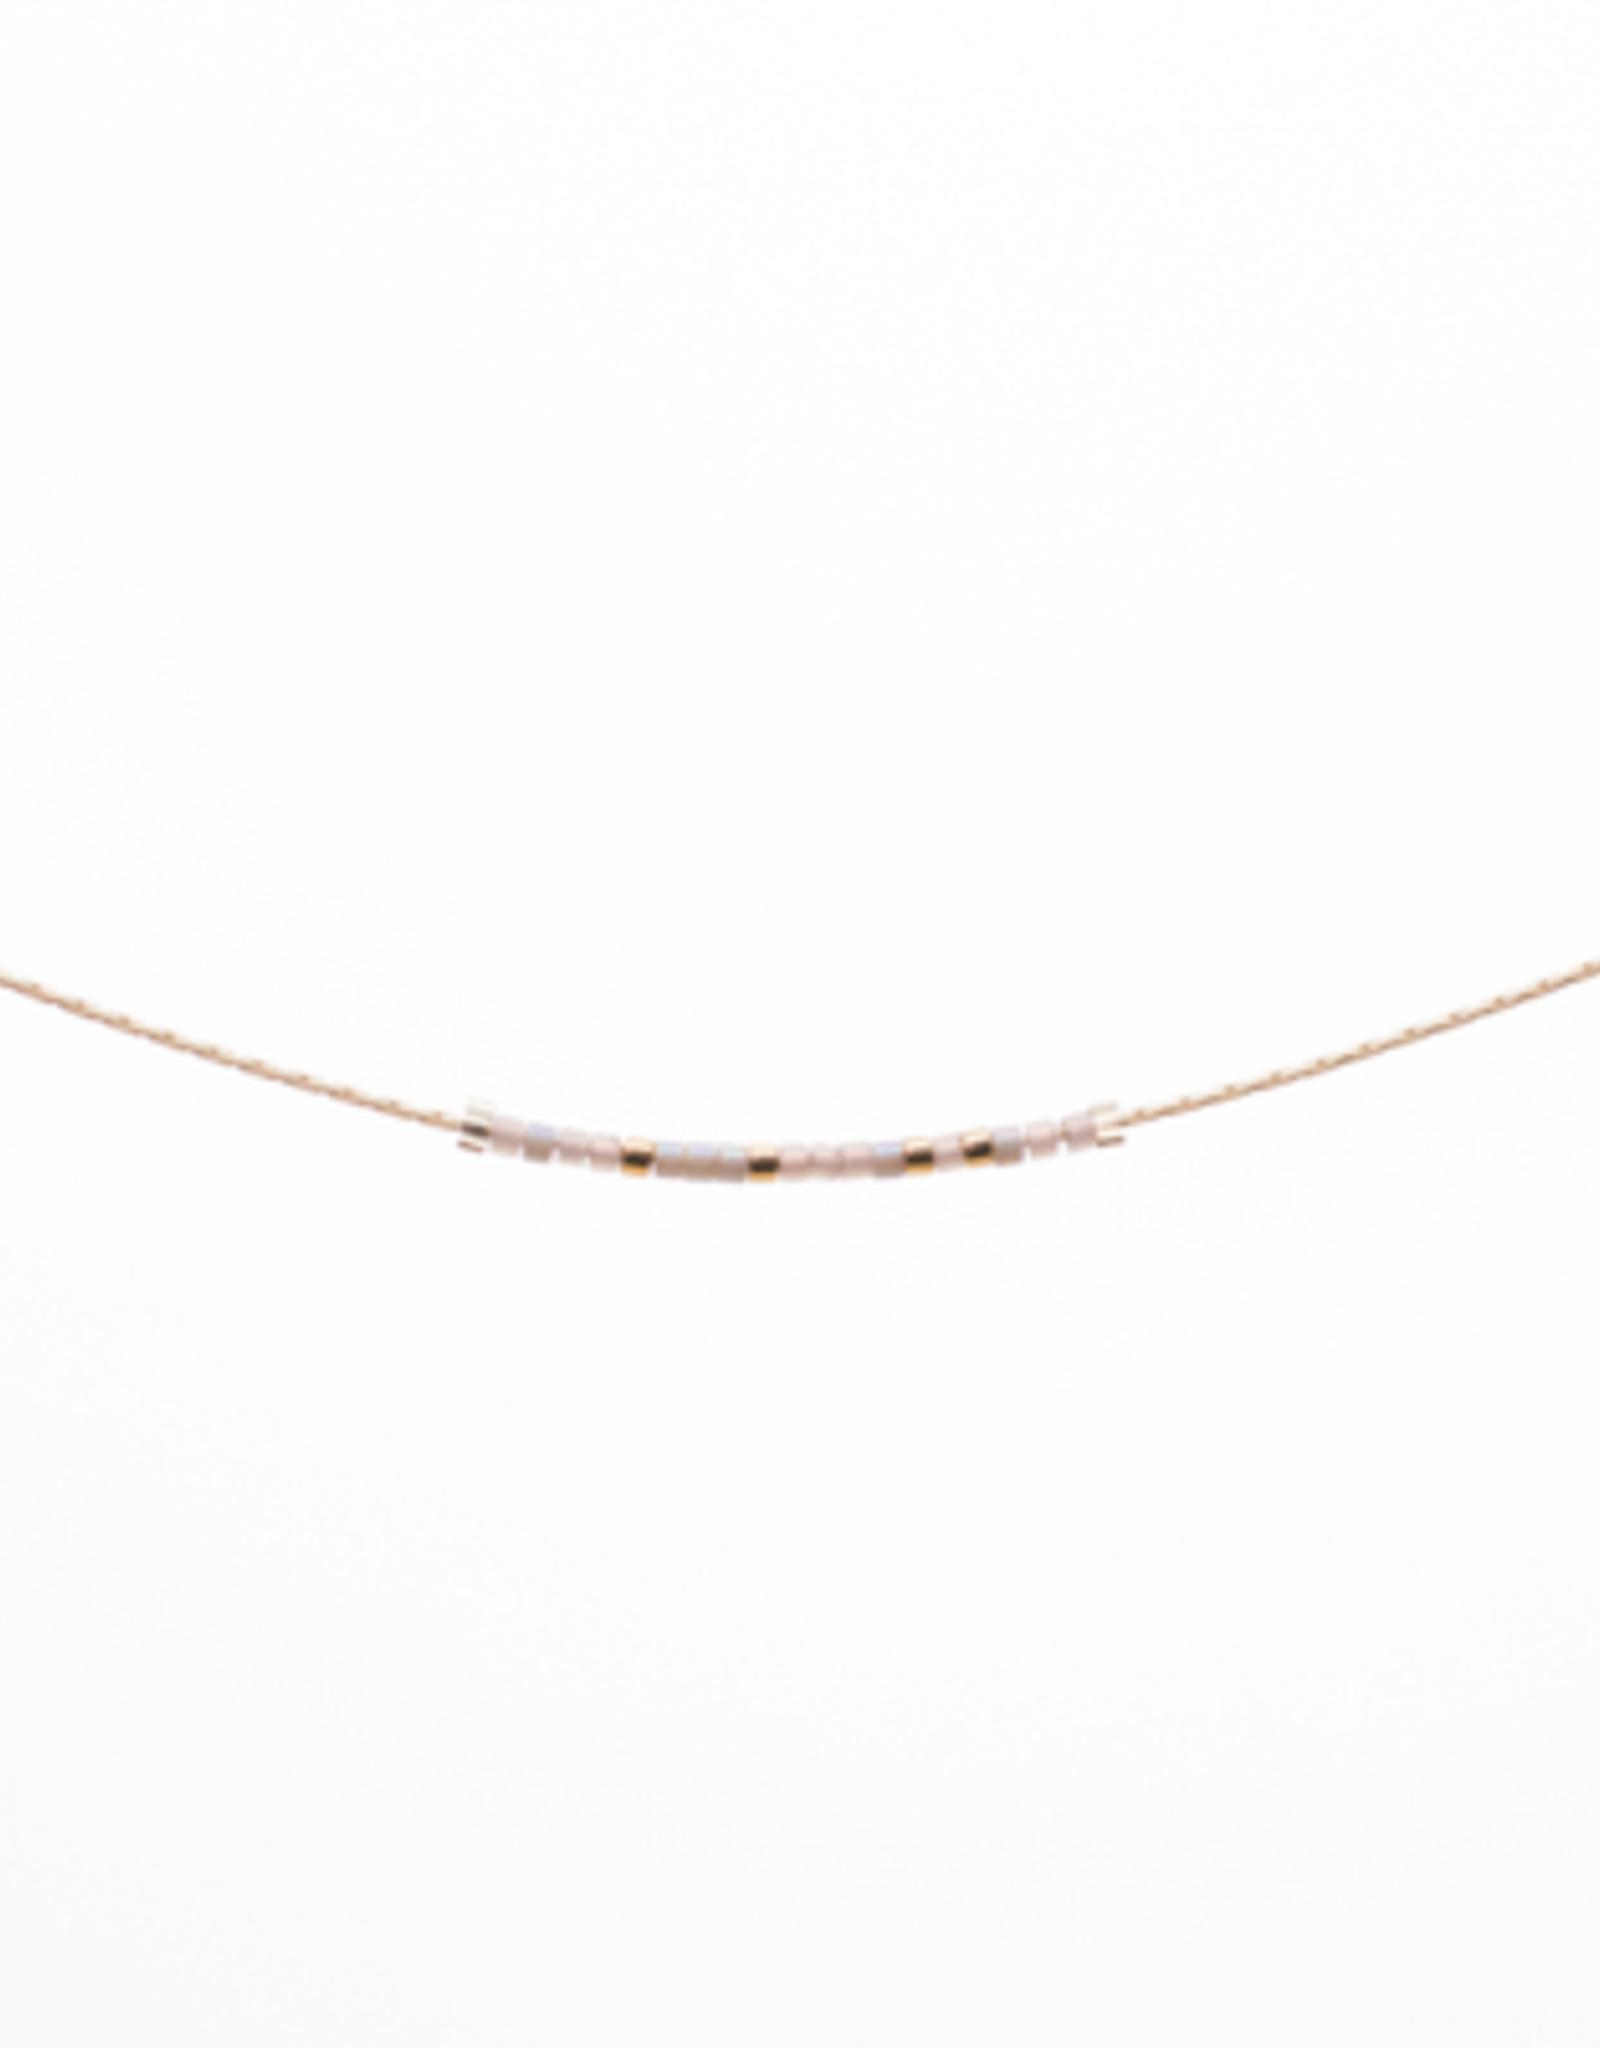 Morse Code Necklace Loved